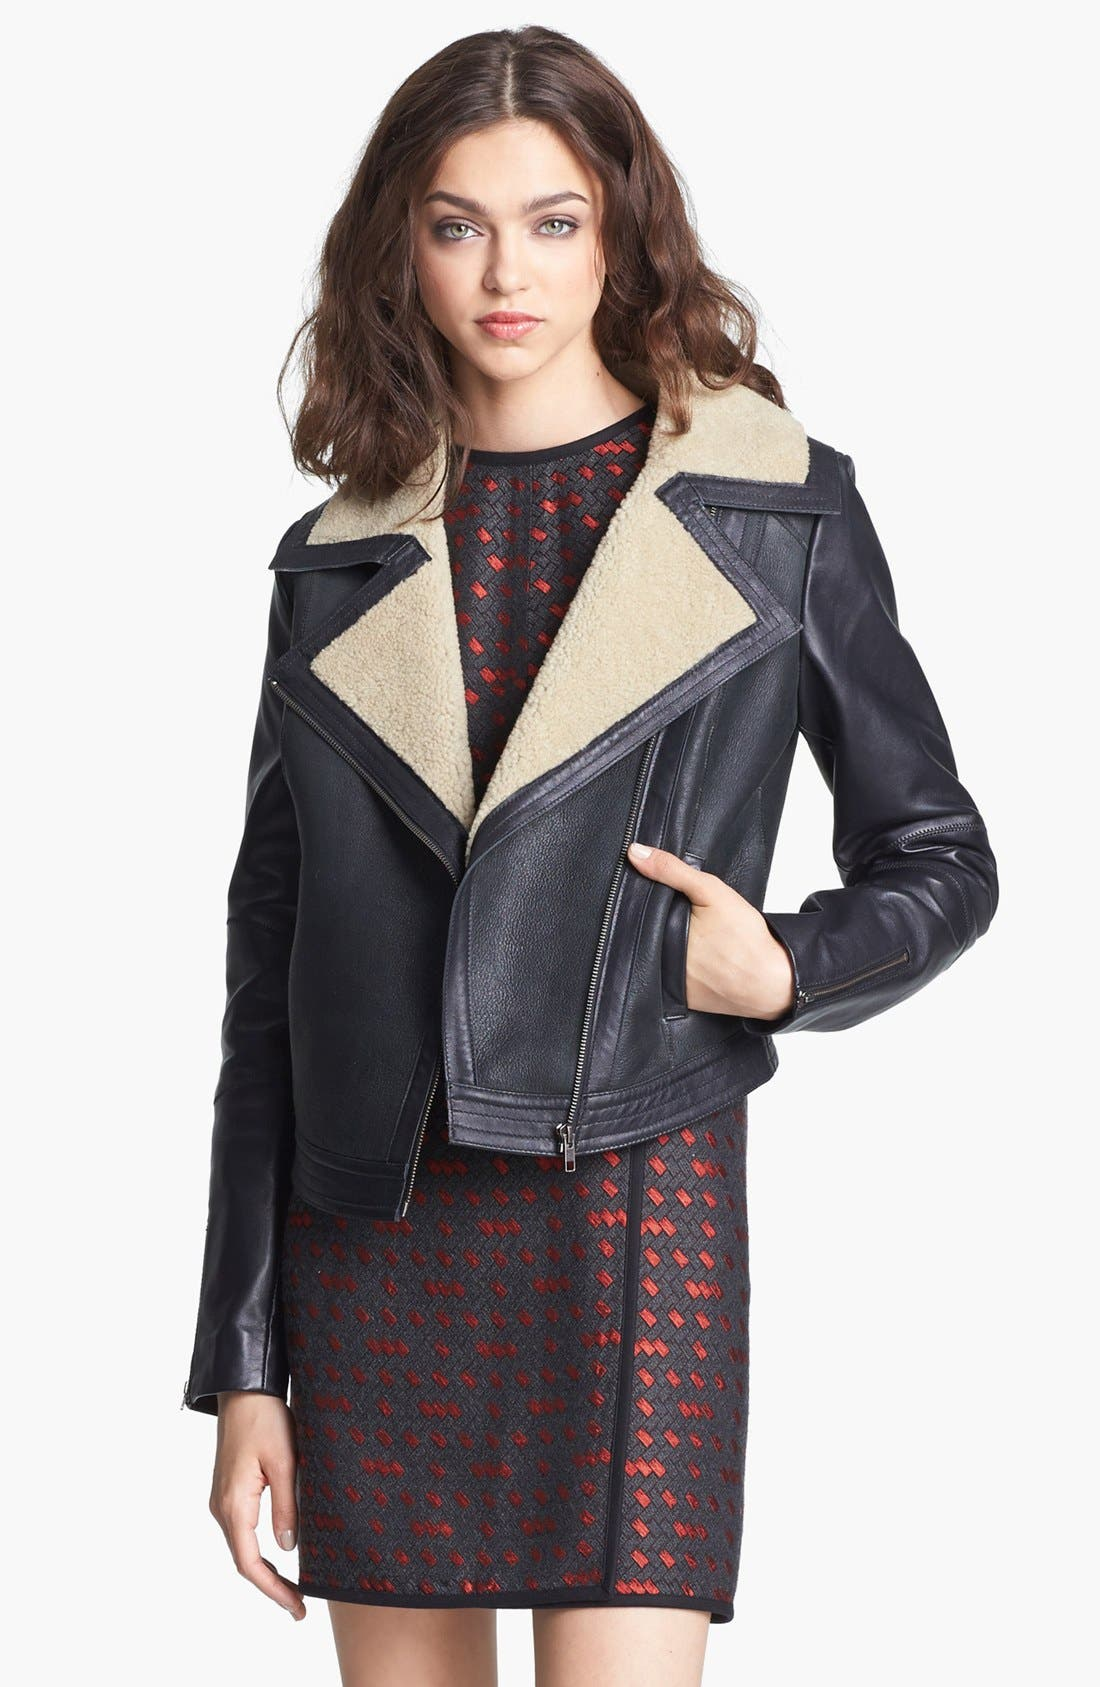 Alternate Image 1 Selected - Miss Wu Genuine Shearling Moto Jacket (Nordstrom Exclusive)